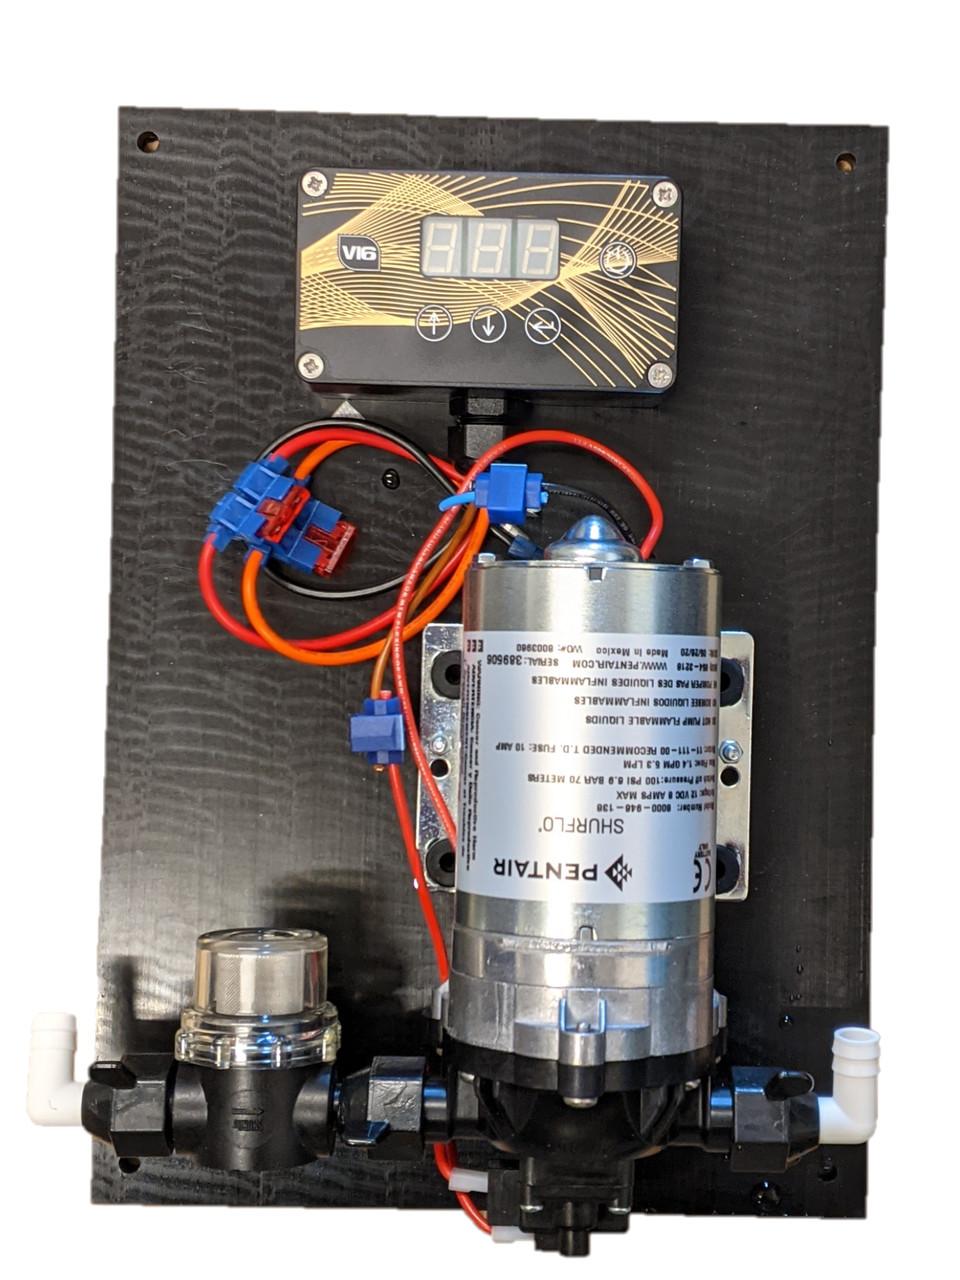 Wintecs Pump Controller with Options